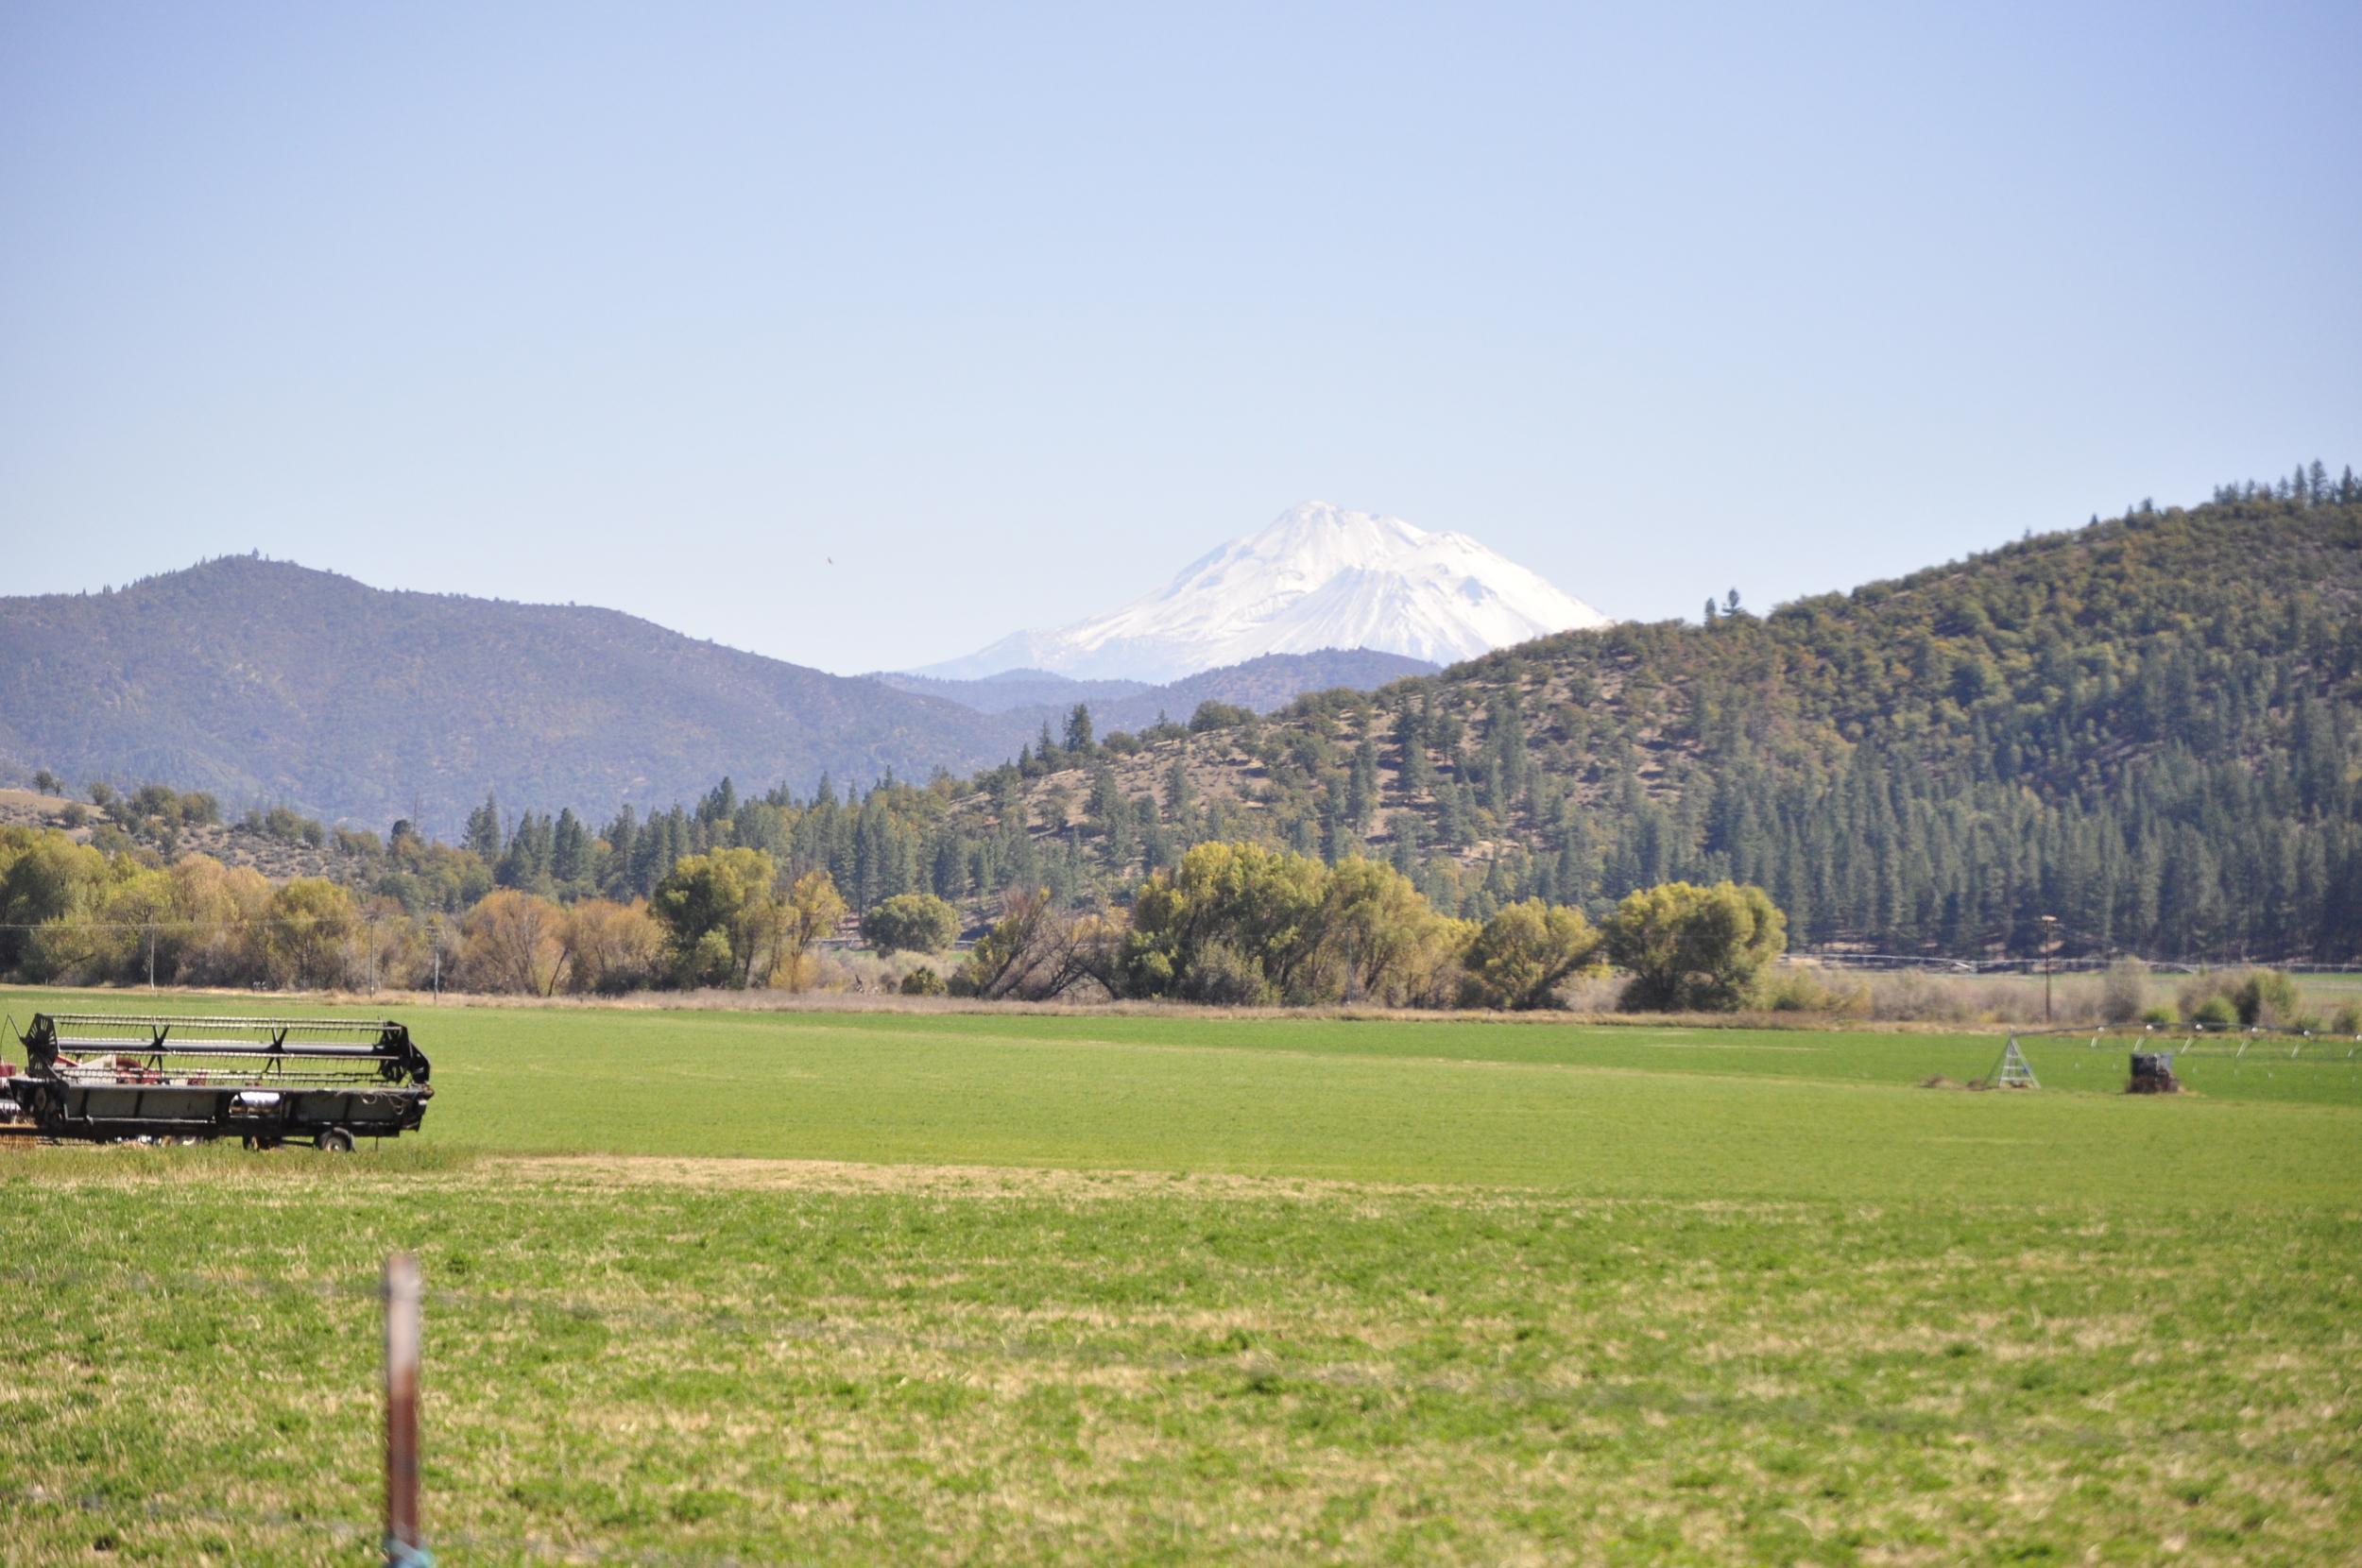 Scott Valley with Mt. Shasta in the background.